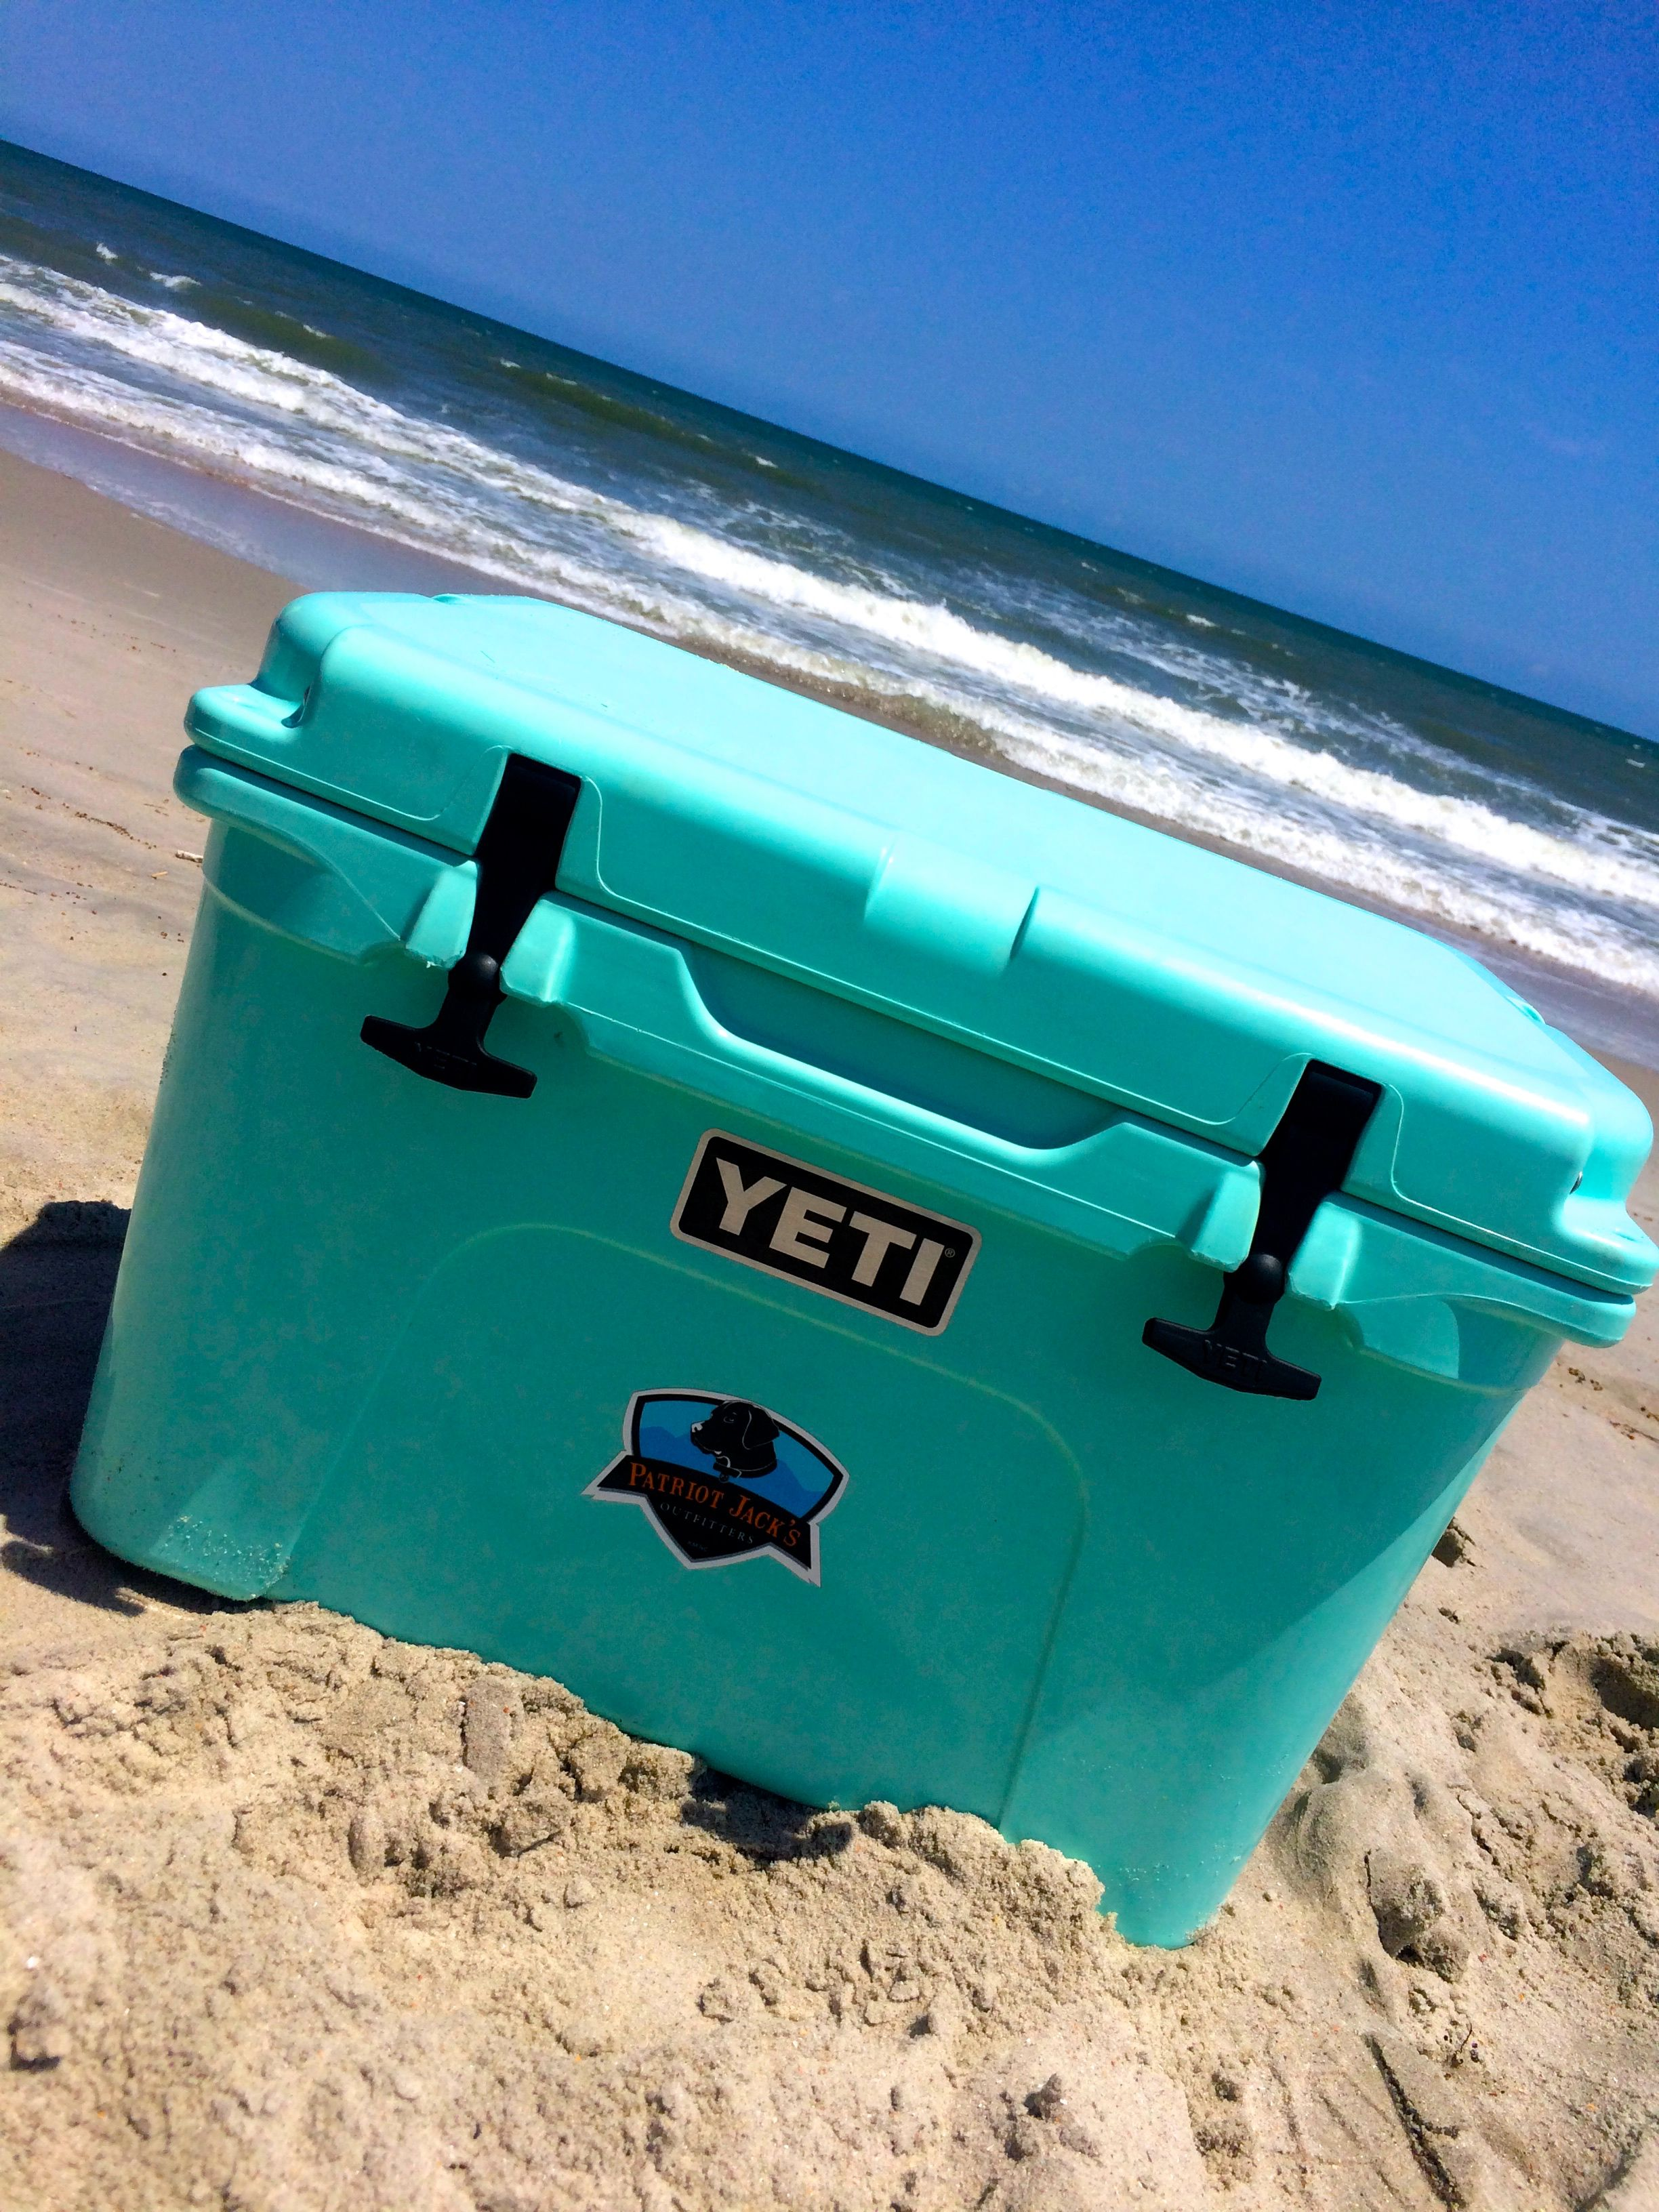 Seafoam Green Yeti Cooler 35 Limited Edition Preppy In